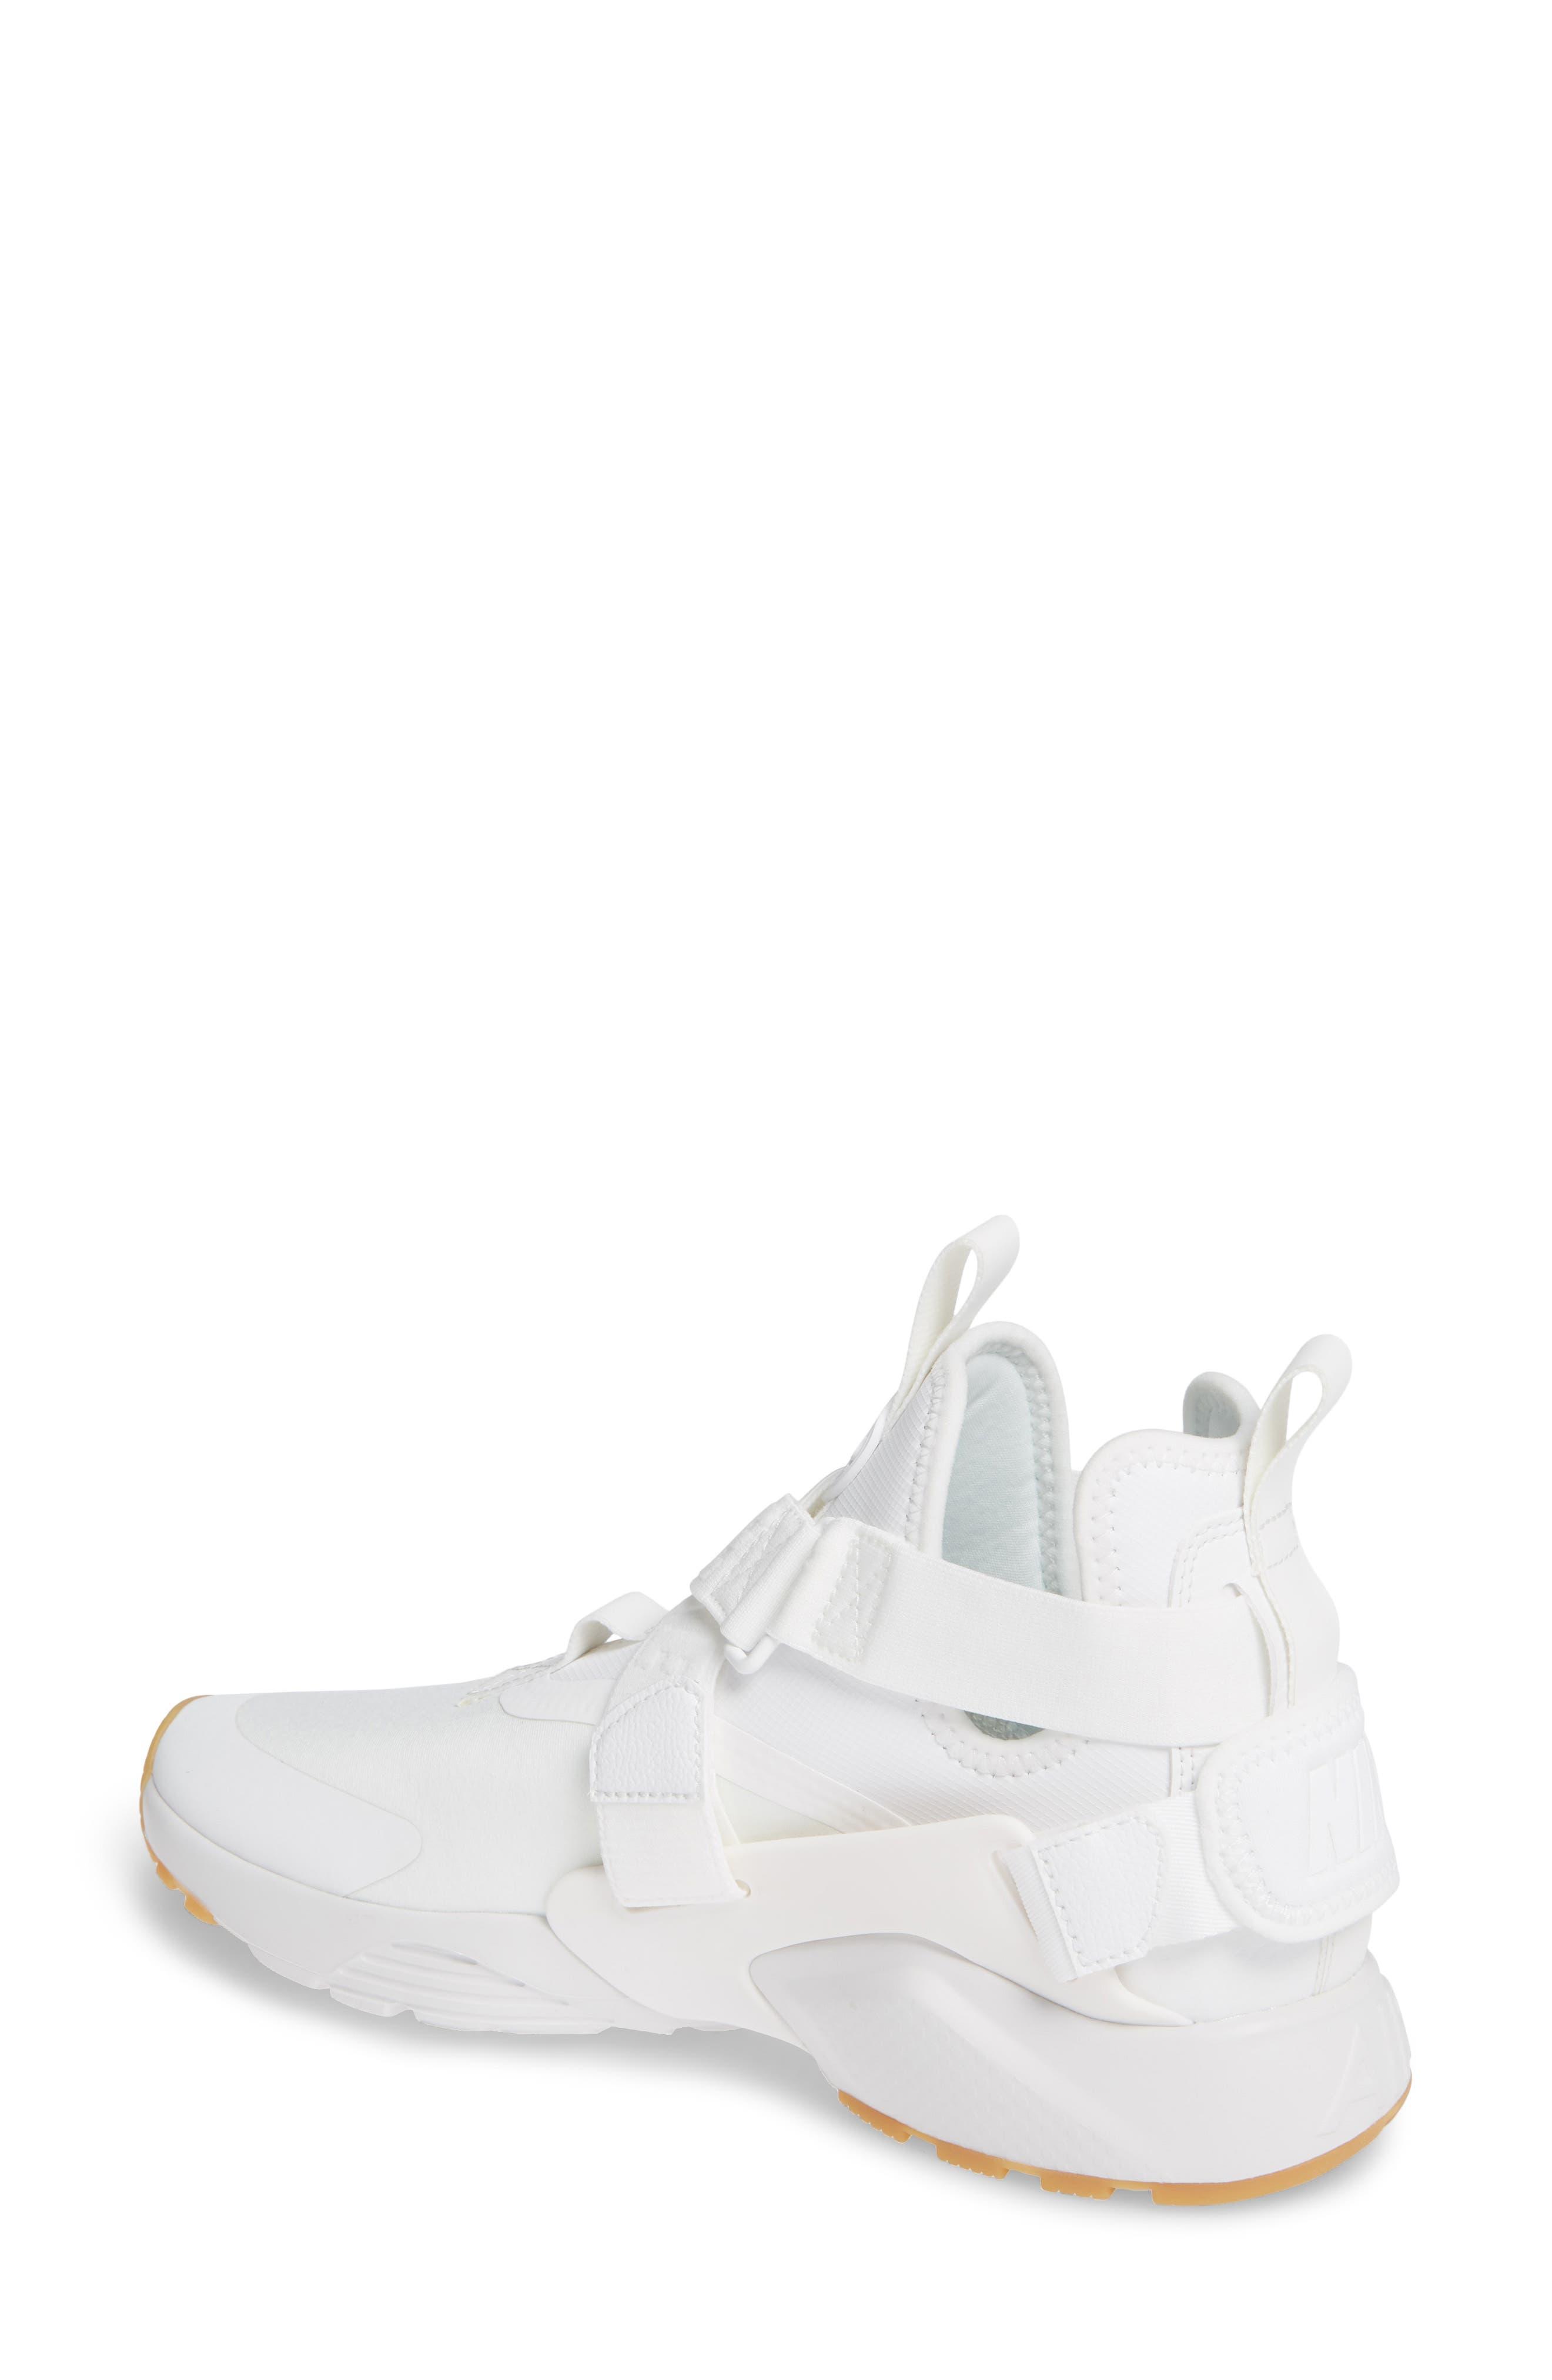 Air Huarache City Sneaker,                             Alternate thumbnail 2, color,                             104